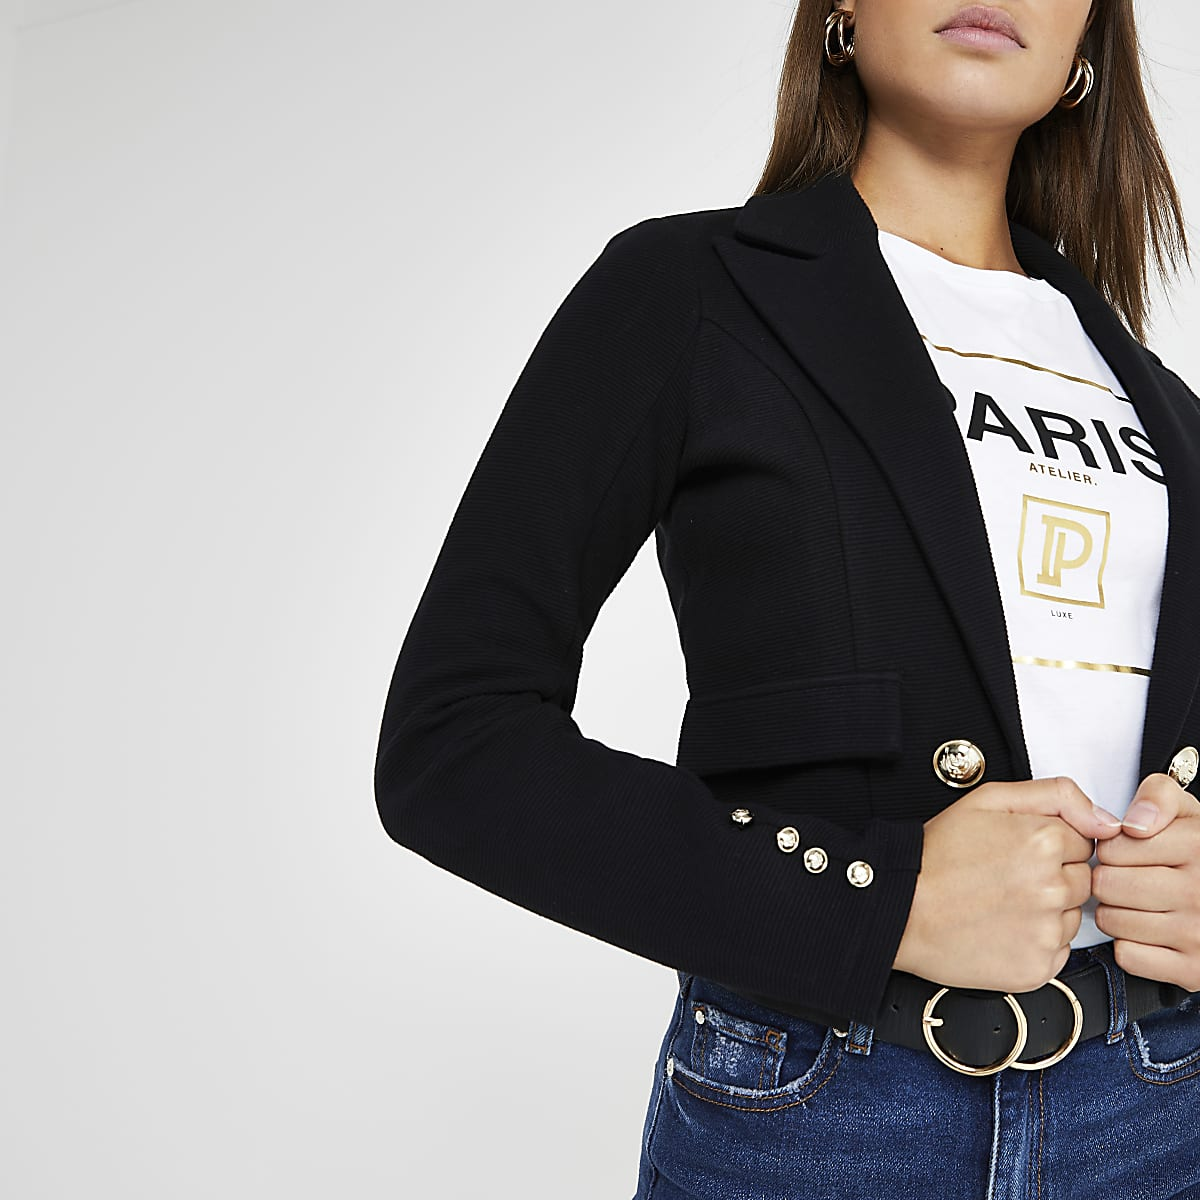 Black crop jersey jacket